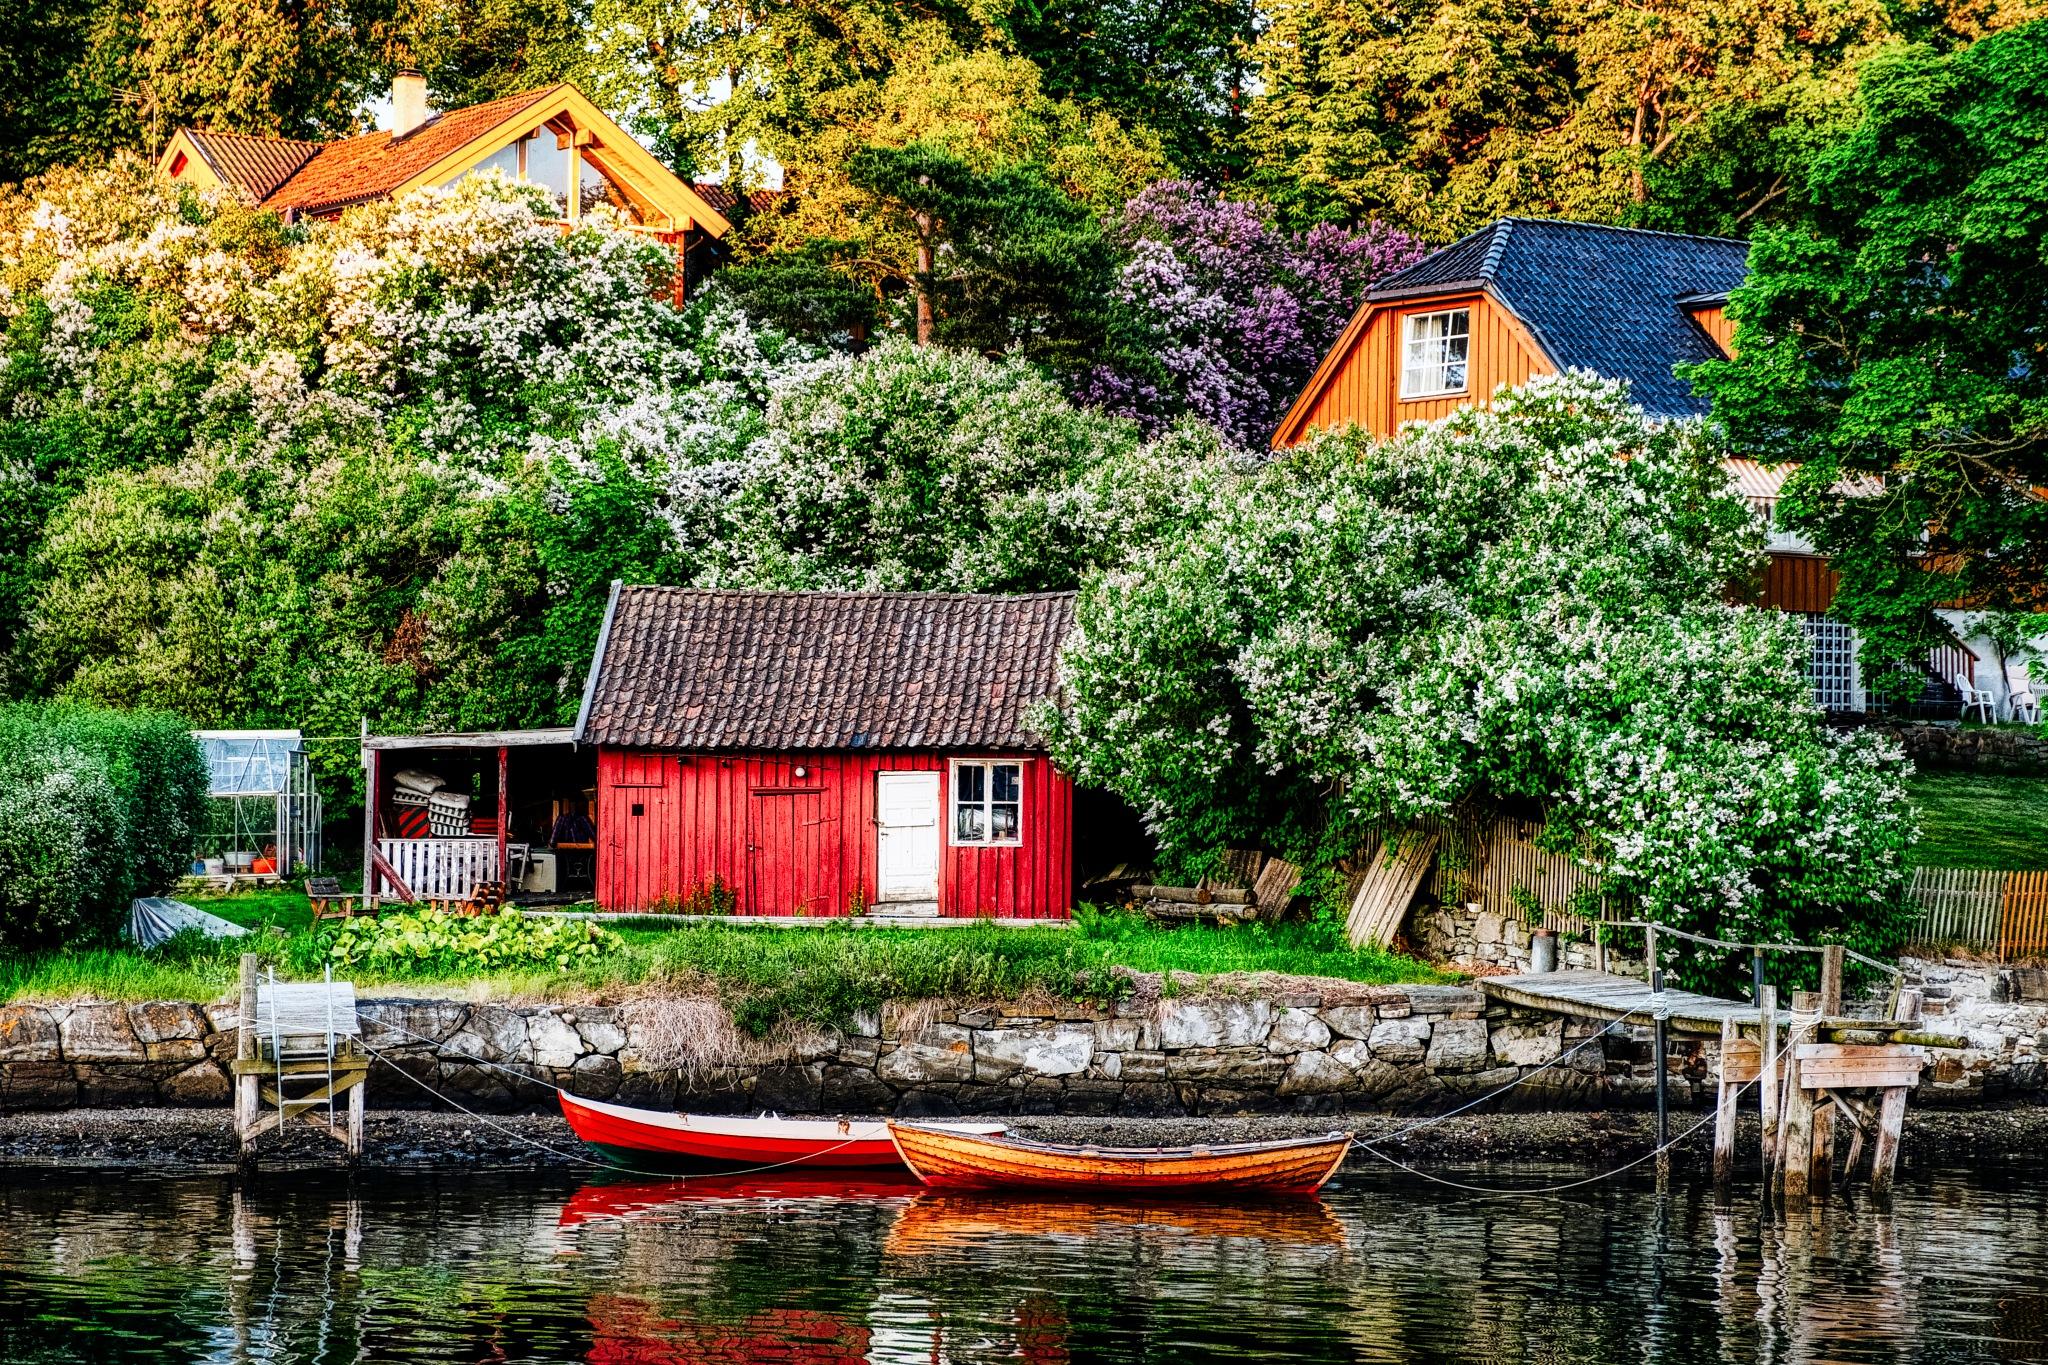 Idyll at Oslo fjord -NORWAY by Goran Jorganovich